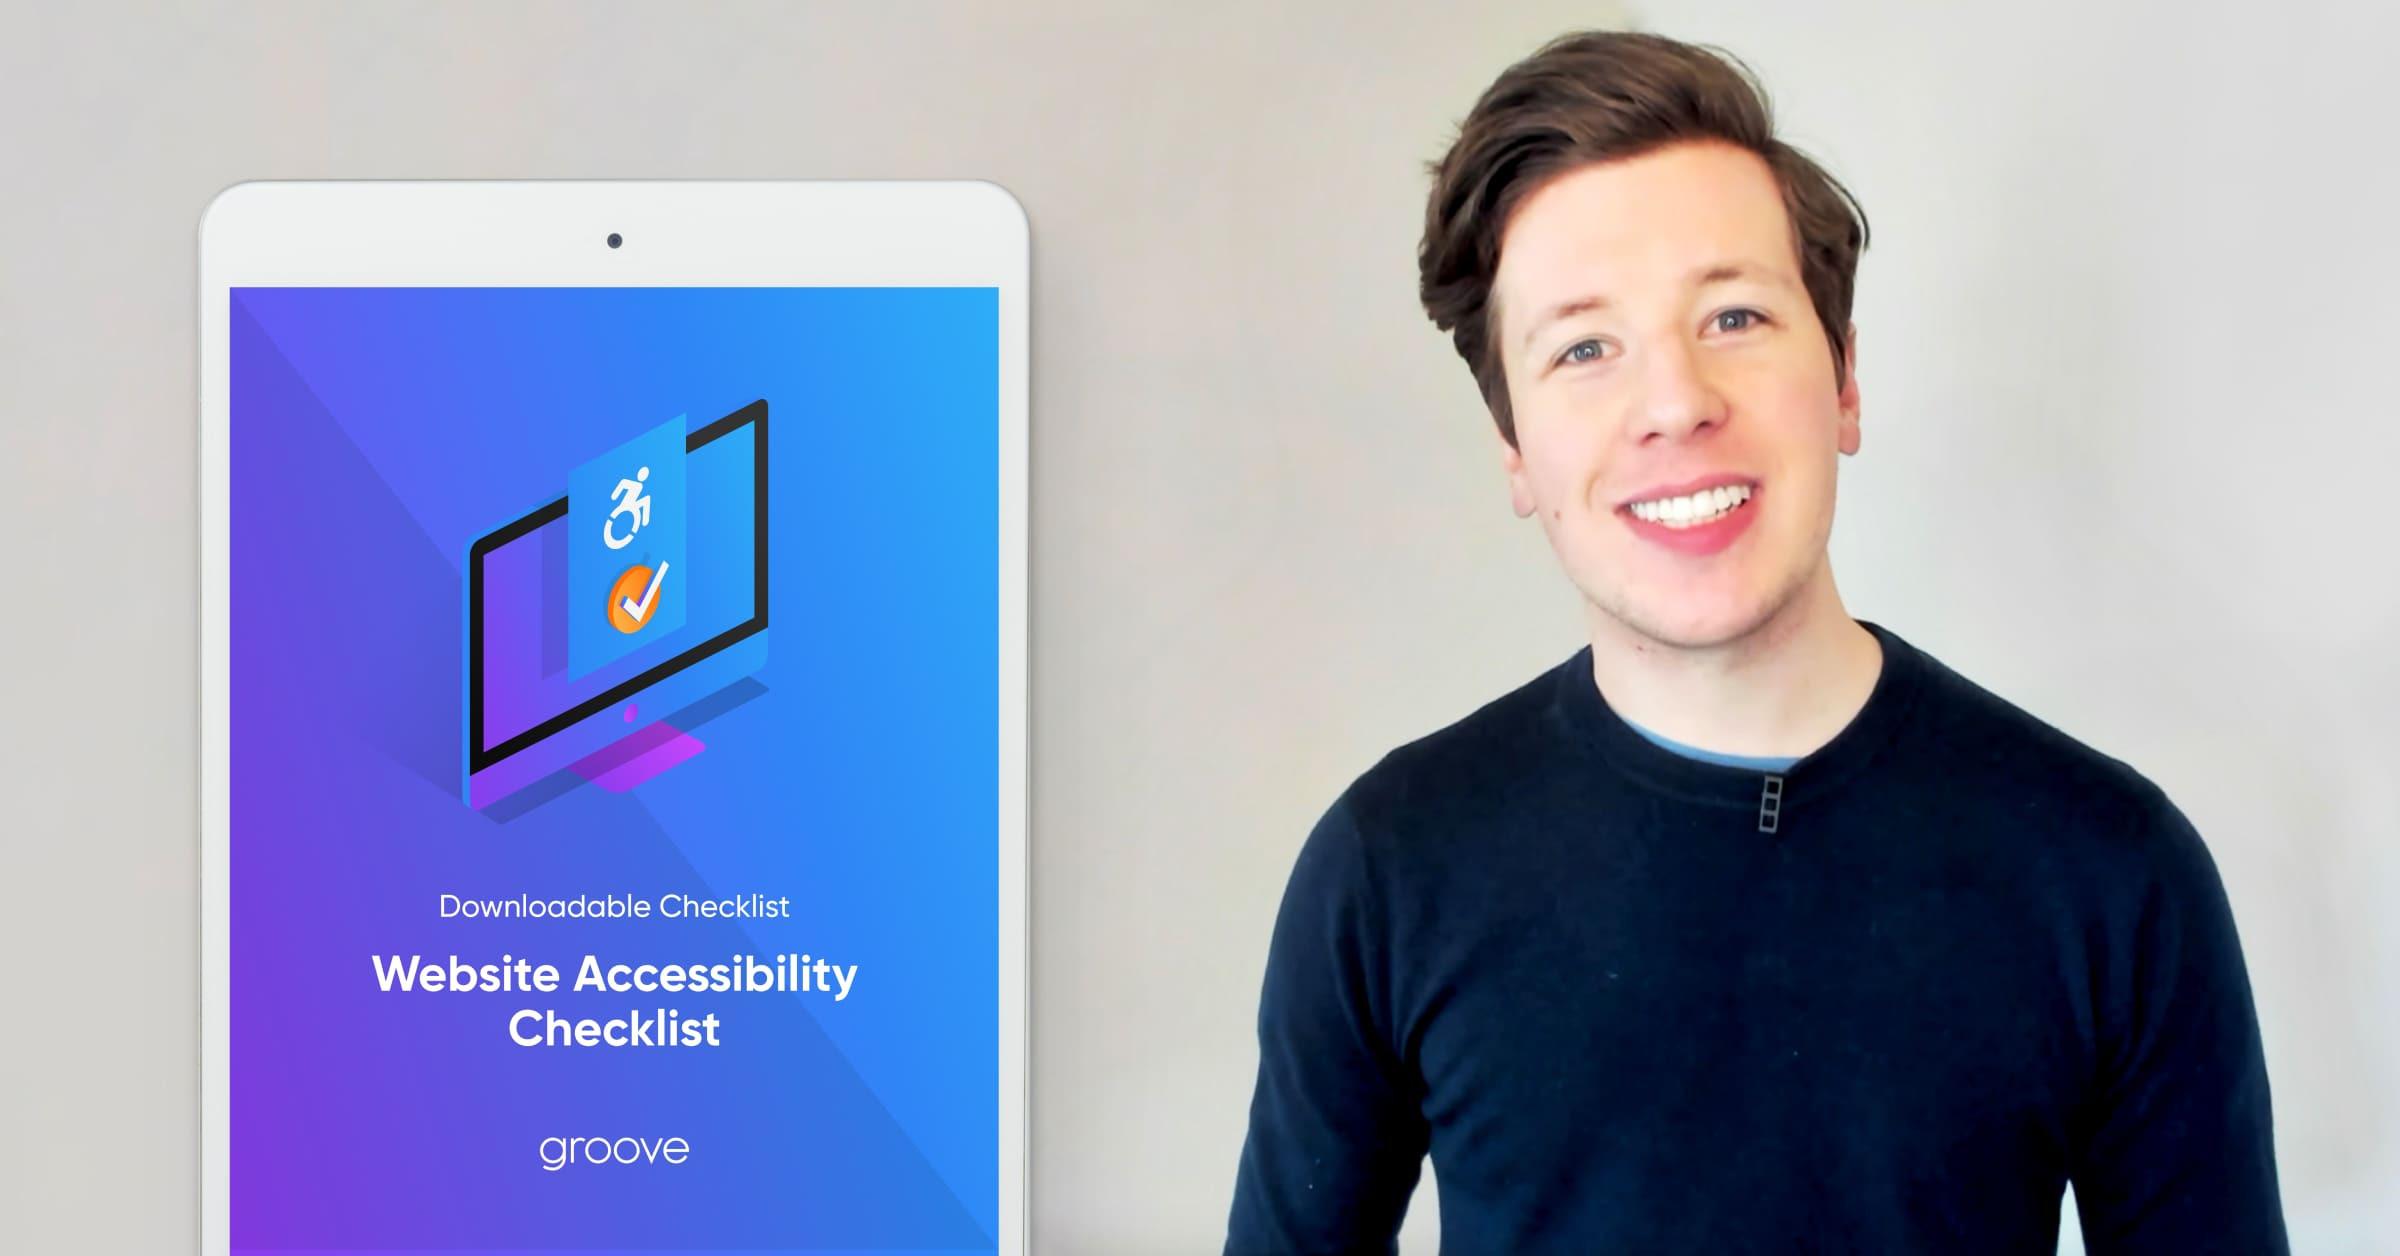 Website Accessibility Checklist Promo Video